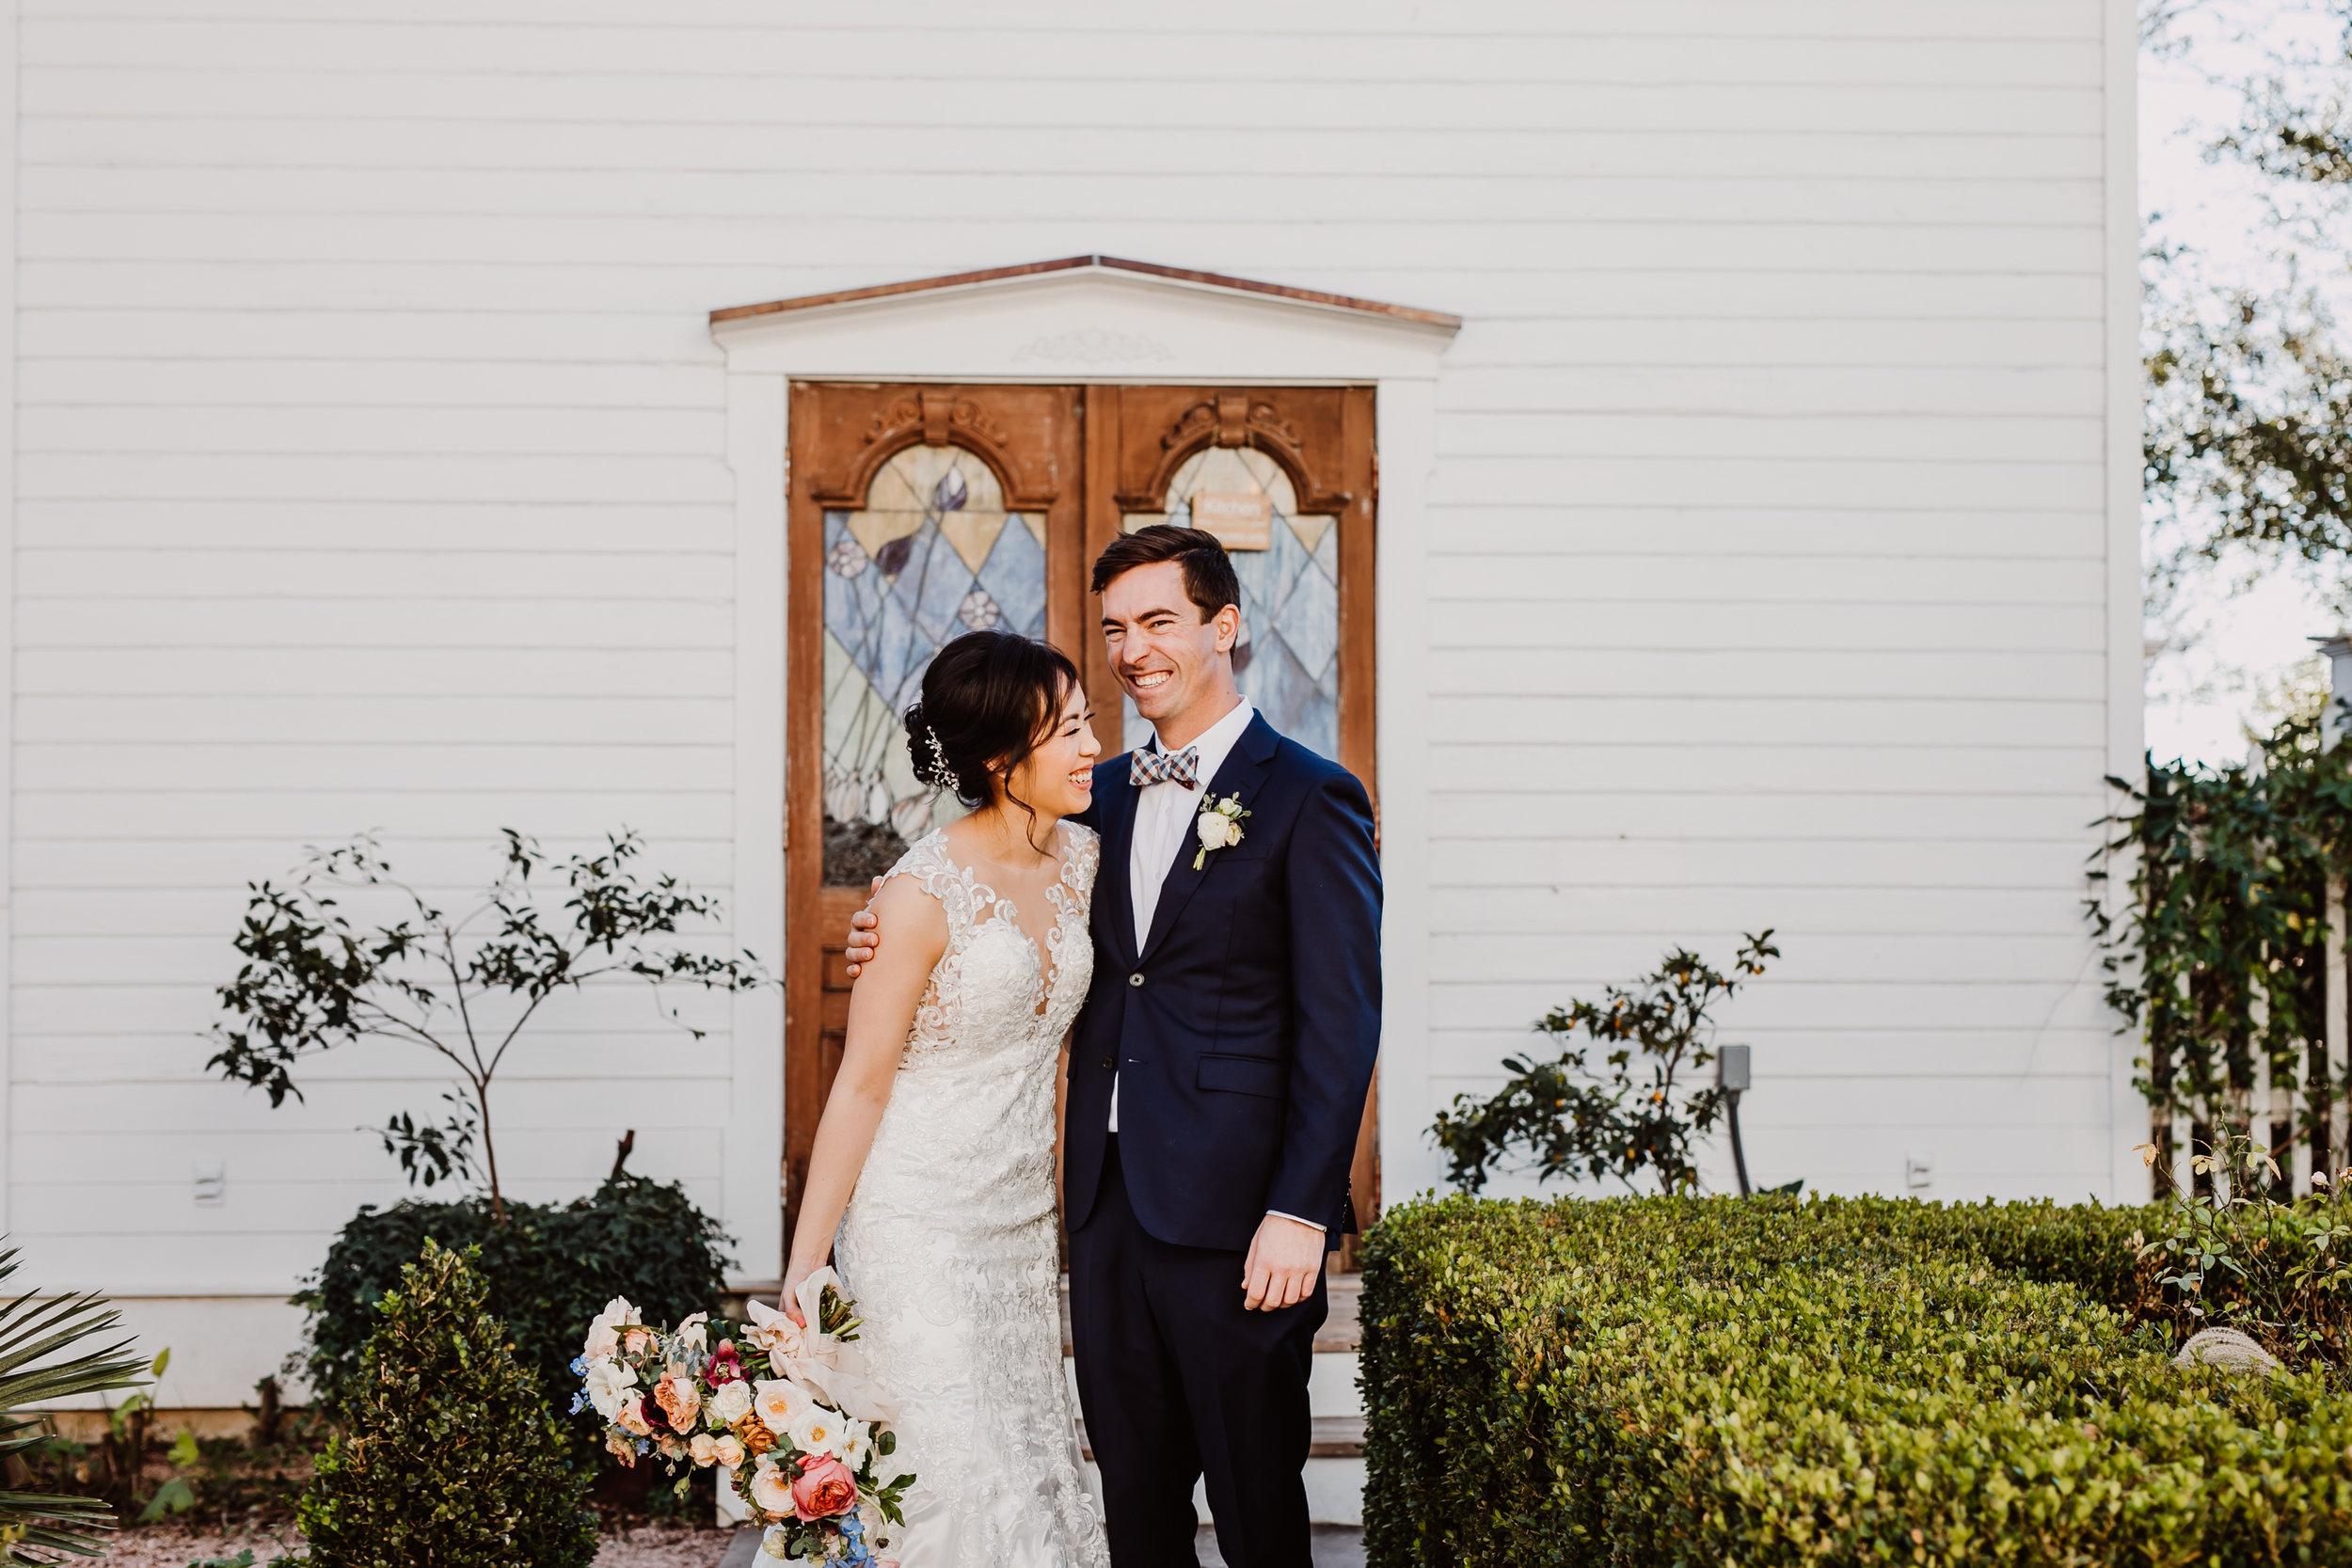 barr mansion bride and groom